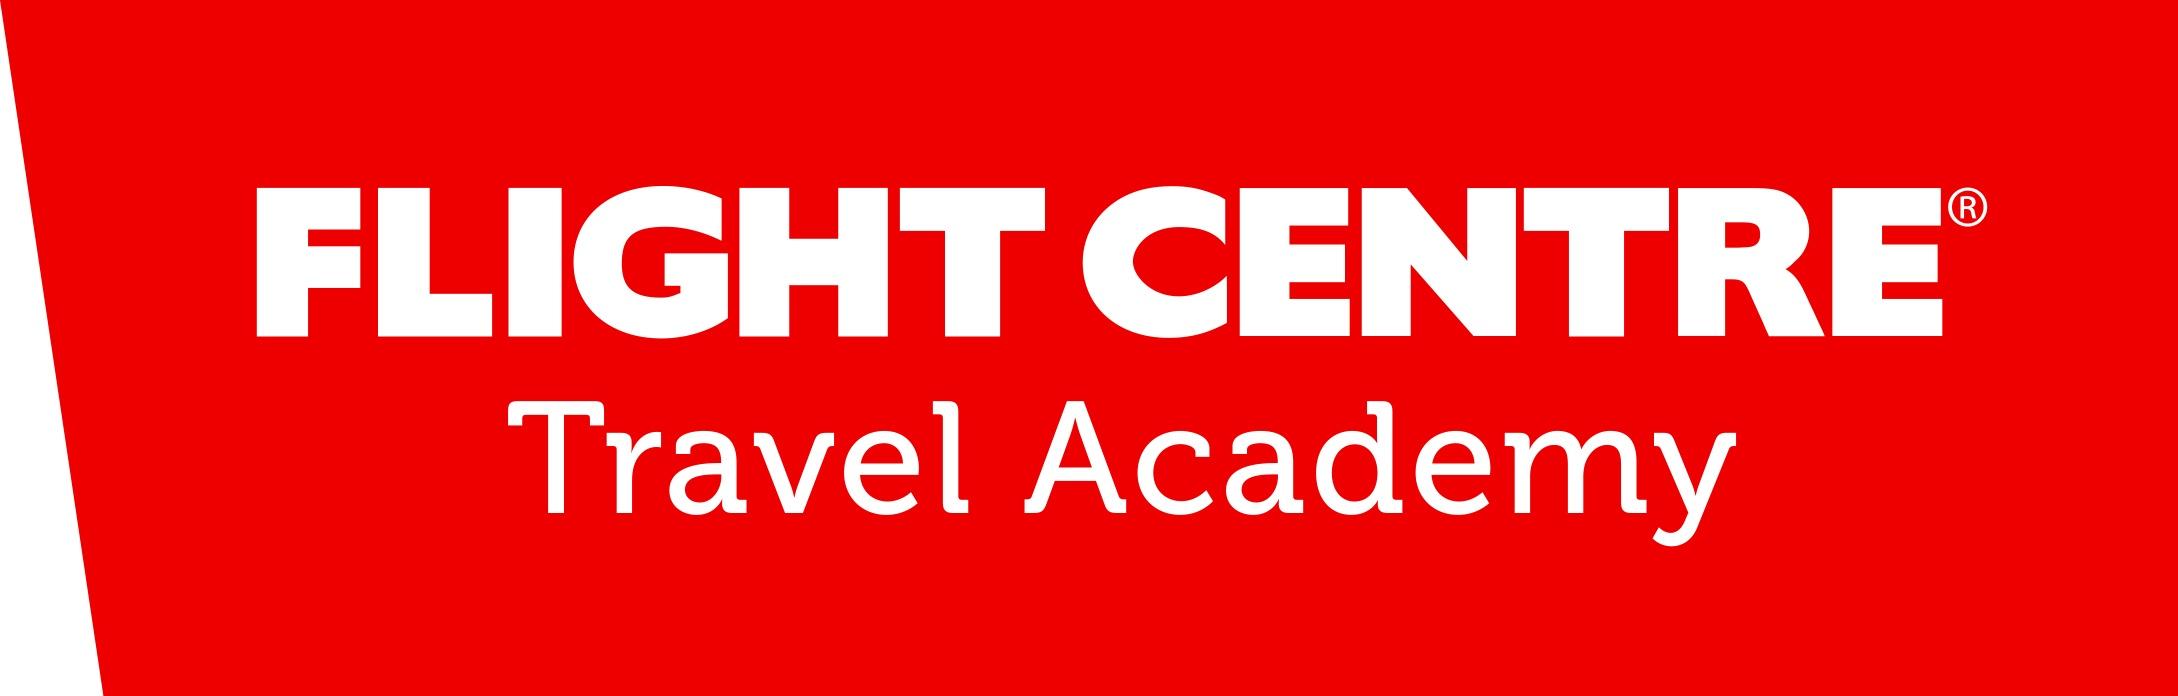 Flight Centre Travel Academy